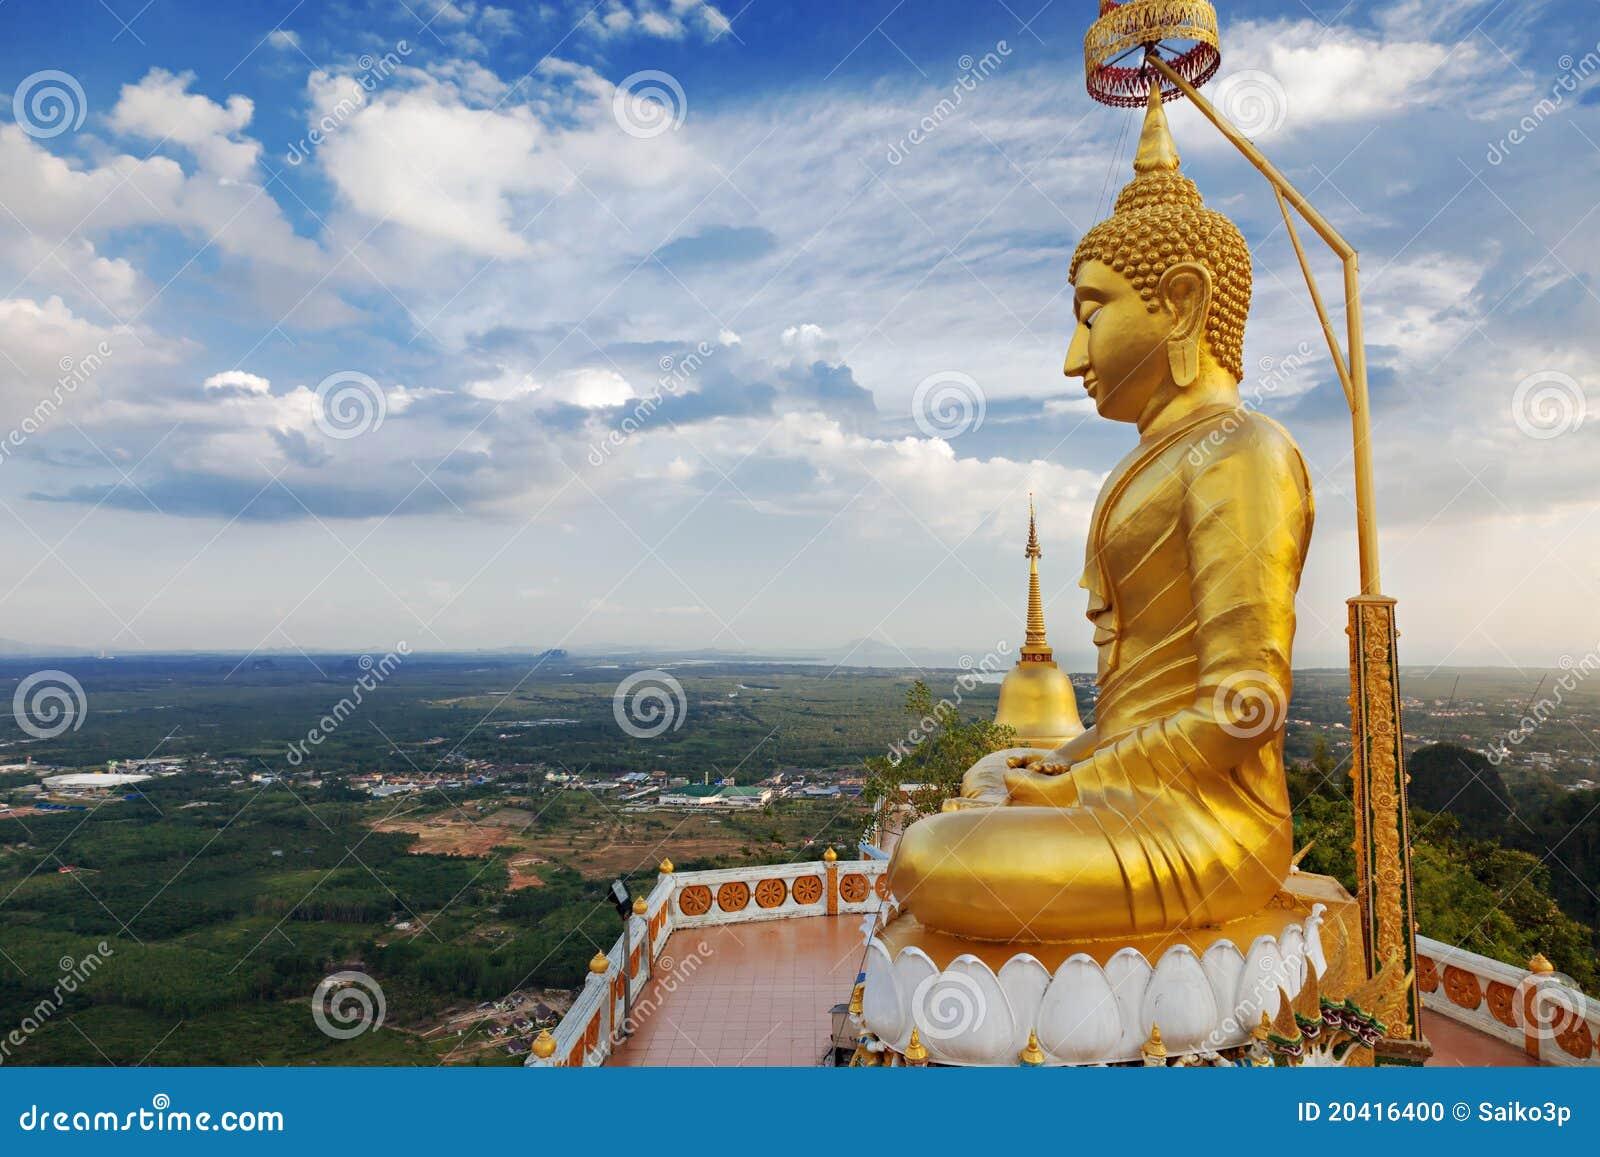 tiff city buddhist personals Lama migmar buddhist rinpoche marion ross sri sri  city state zip code  please send me the 2018 art of living retreat center program.